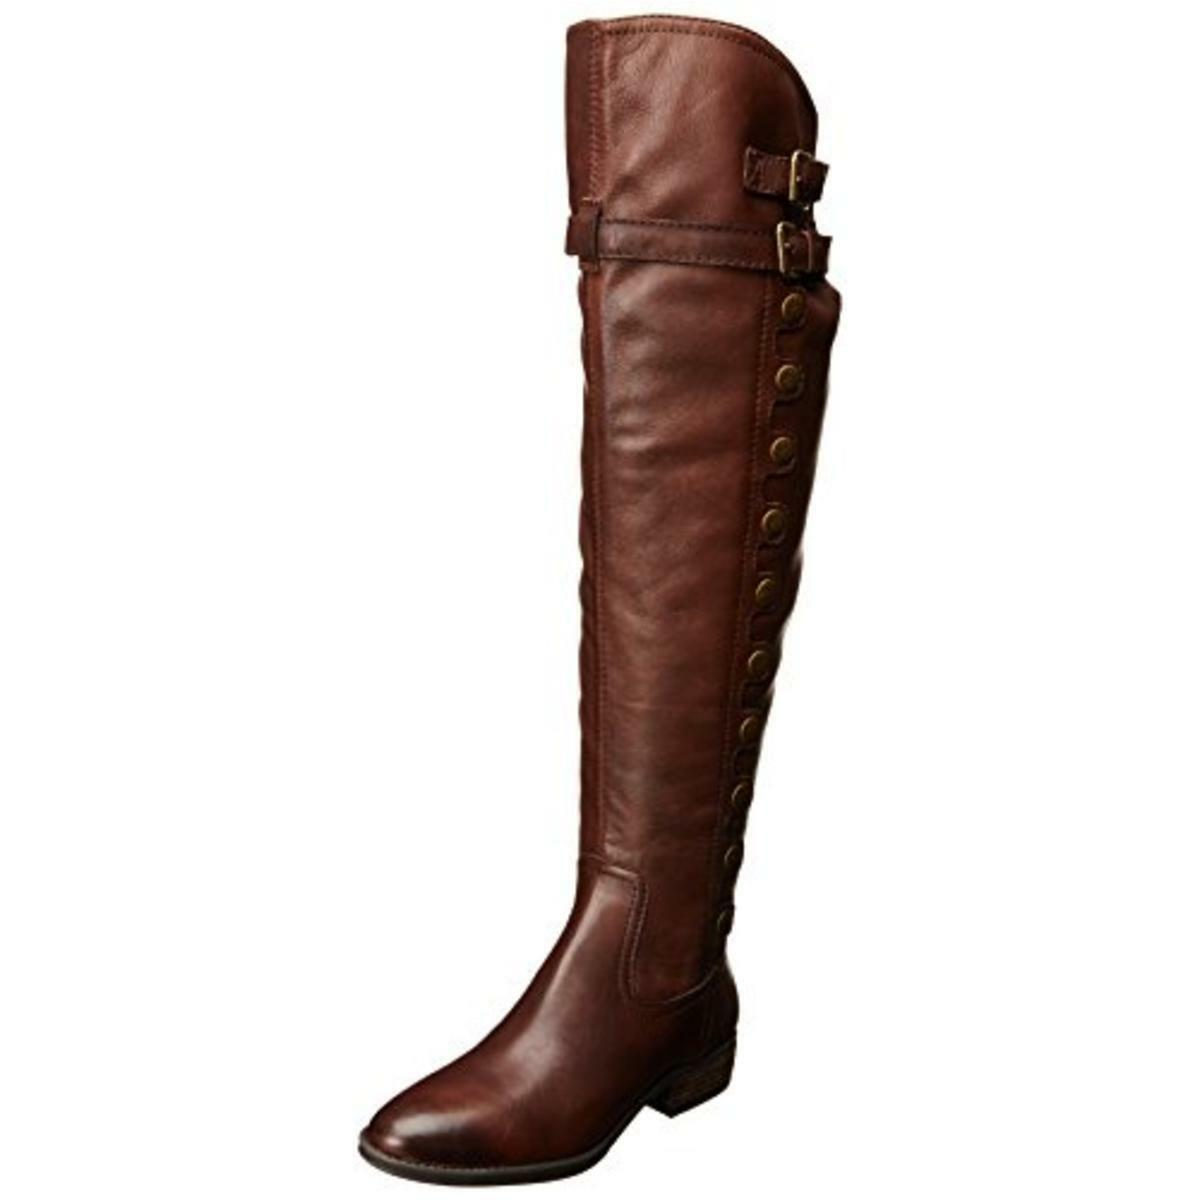 Sam Edelman  Womens Pierce 2 Brown Riding Boots shoes 6 Medium Retails  320.00